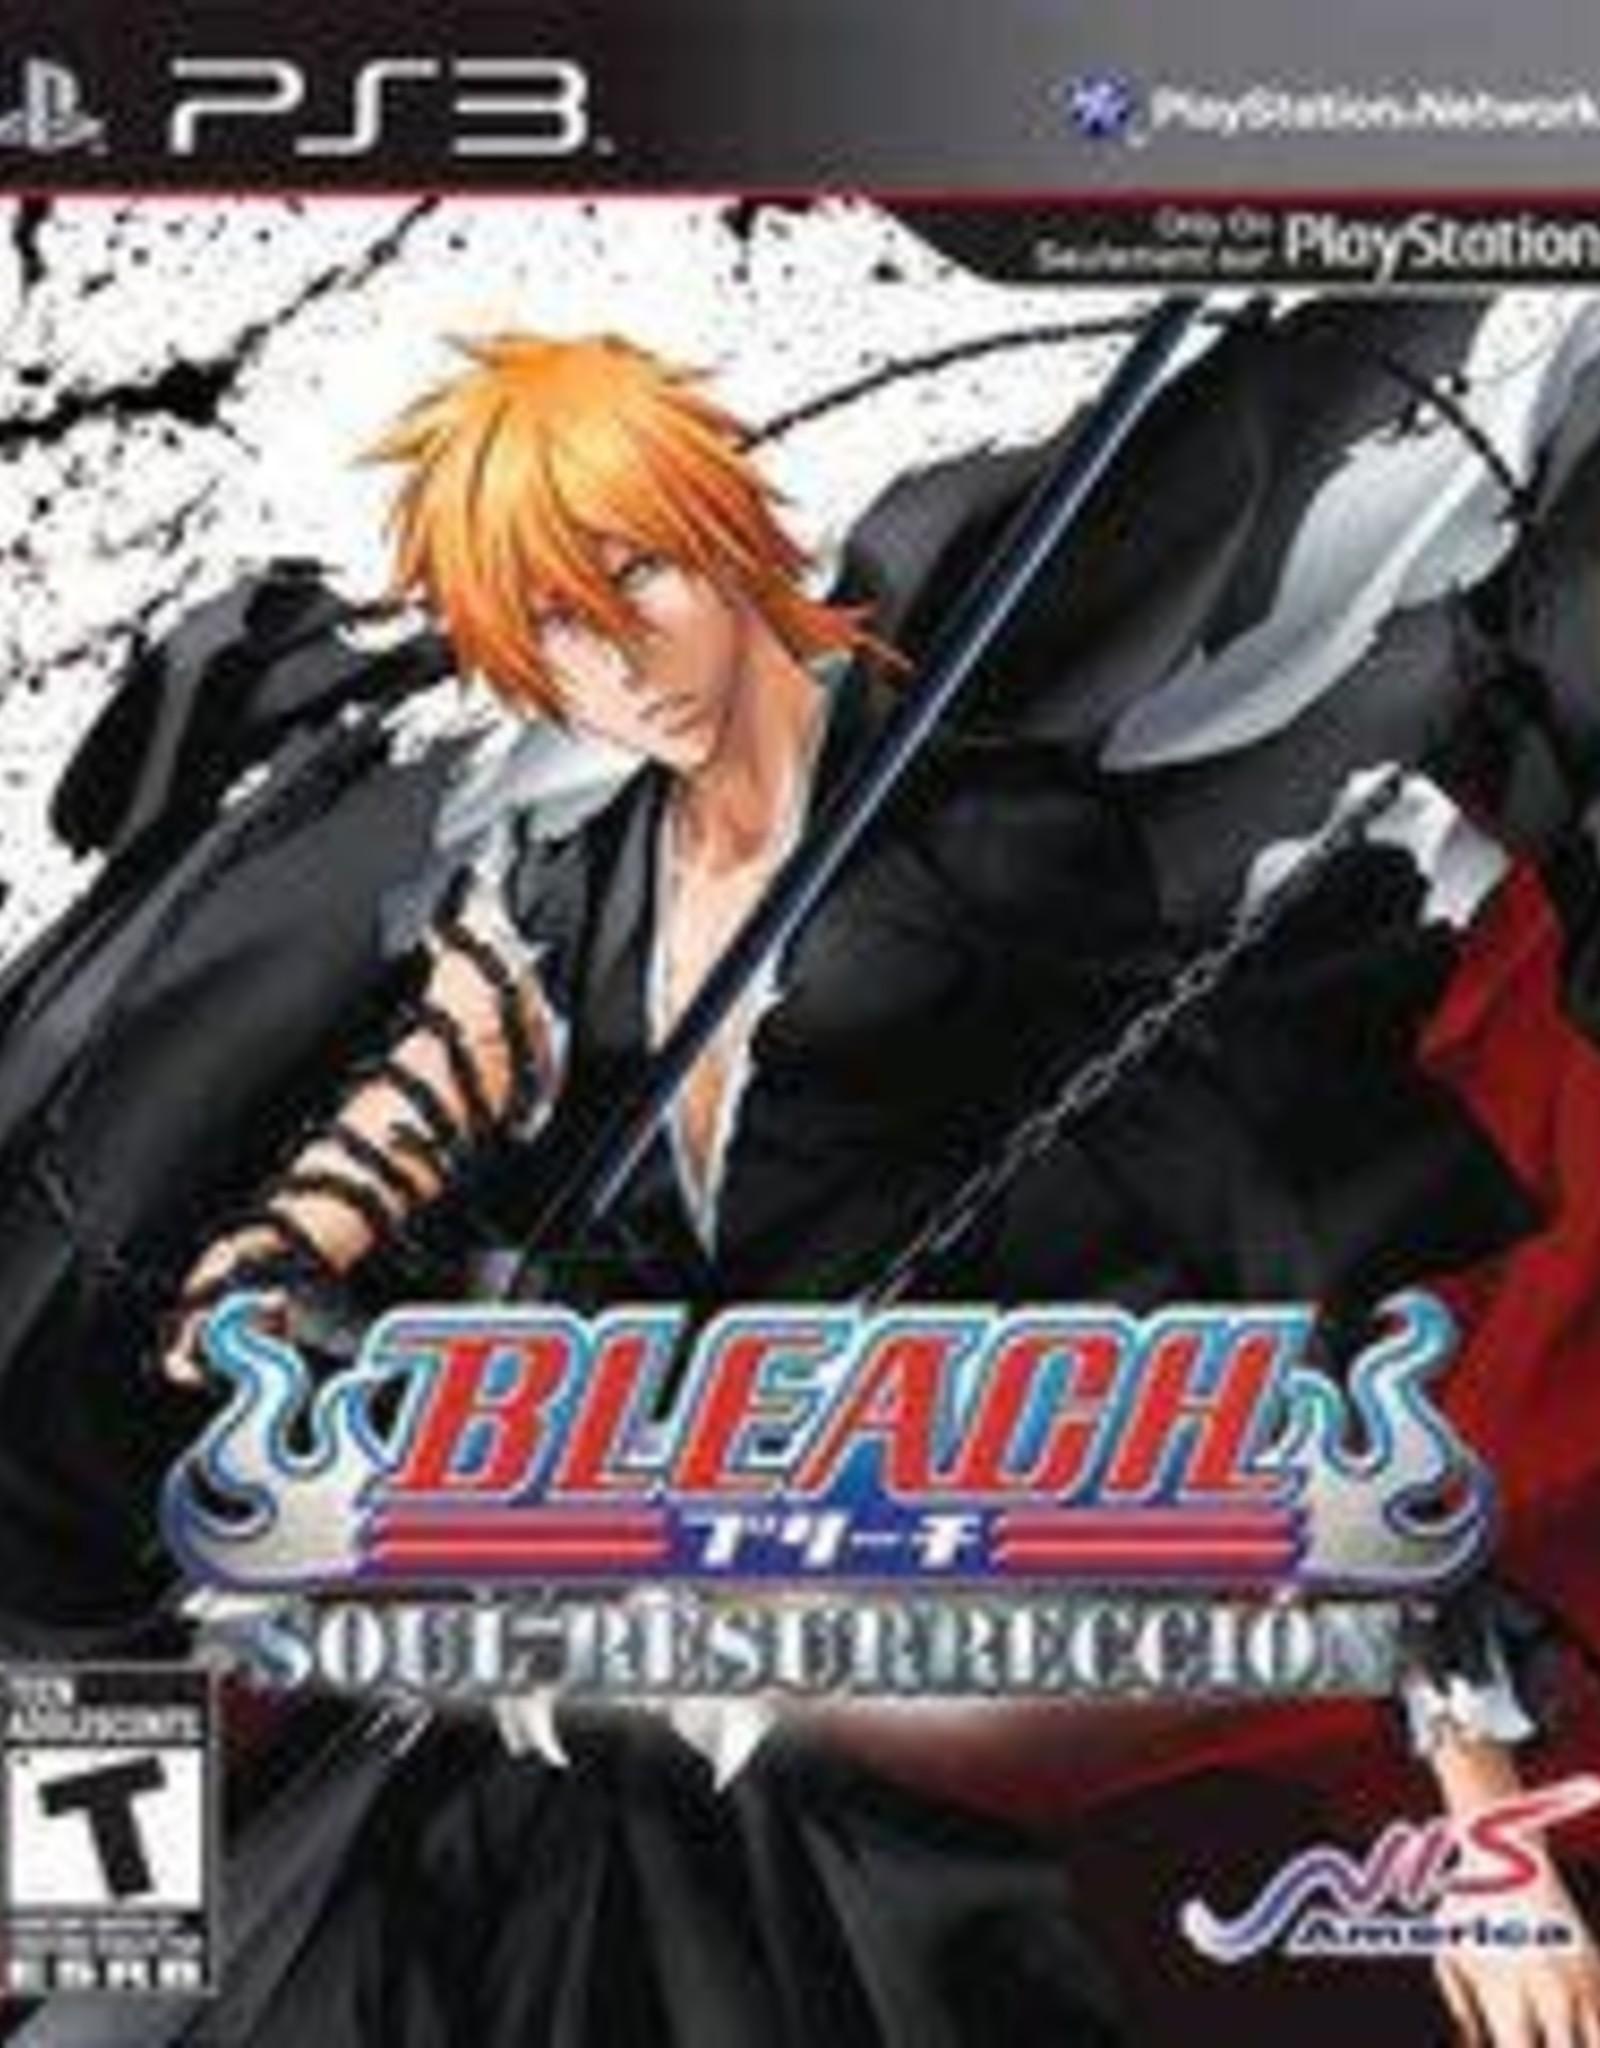 Playstation 3 Bleach: Soul Resurreccion (CIB)